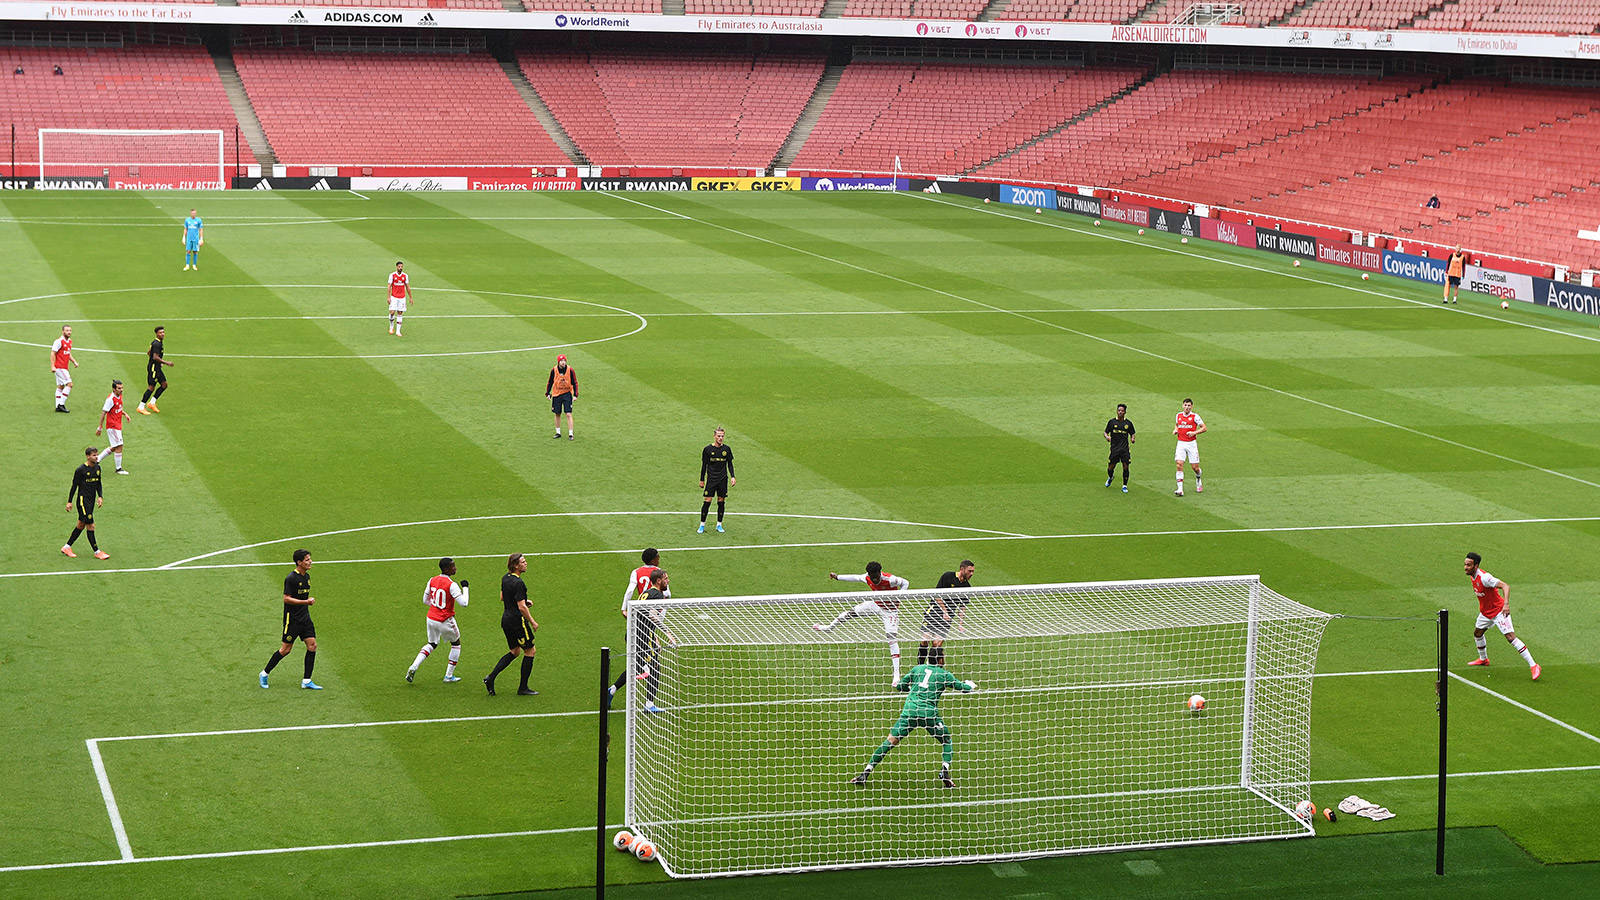 - Match Arsenal  | 2-3 Friendly: report Post Brentford